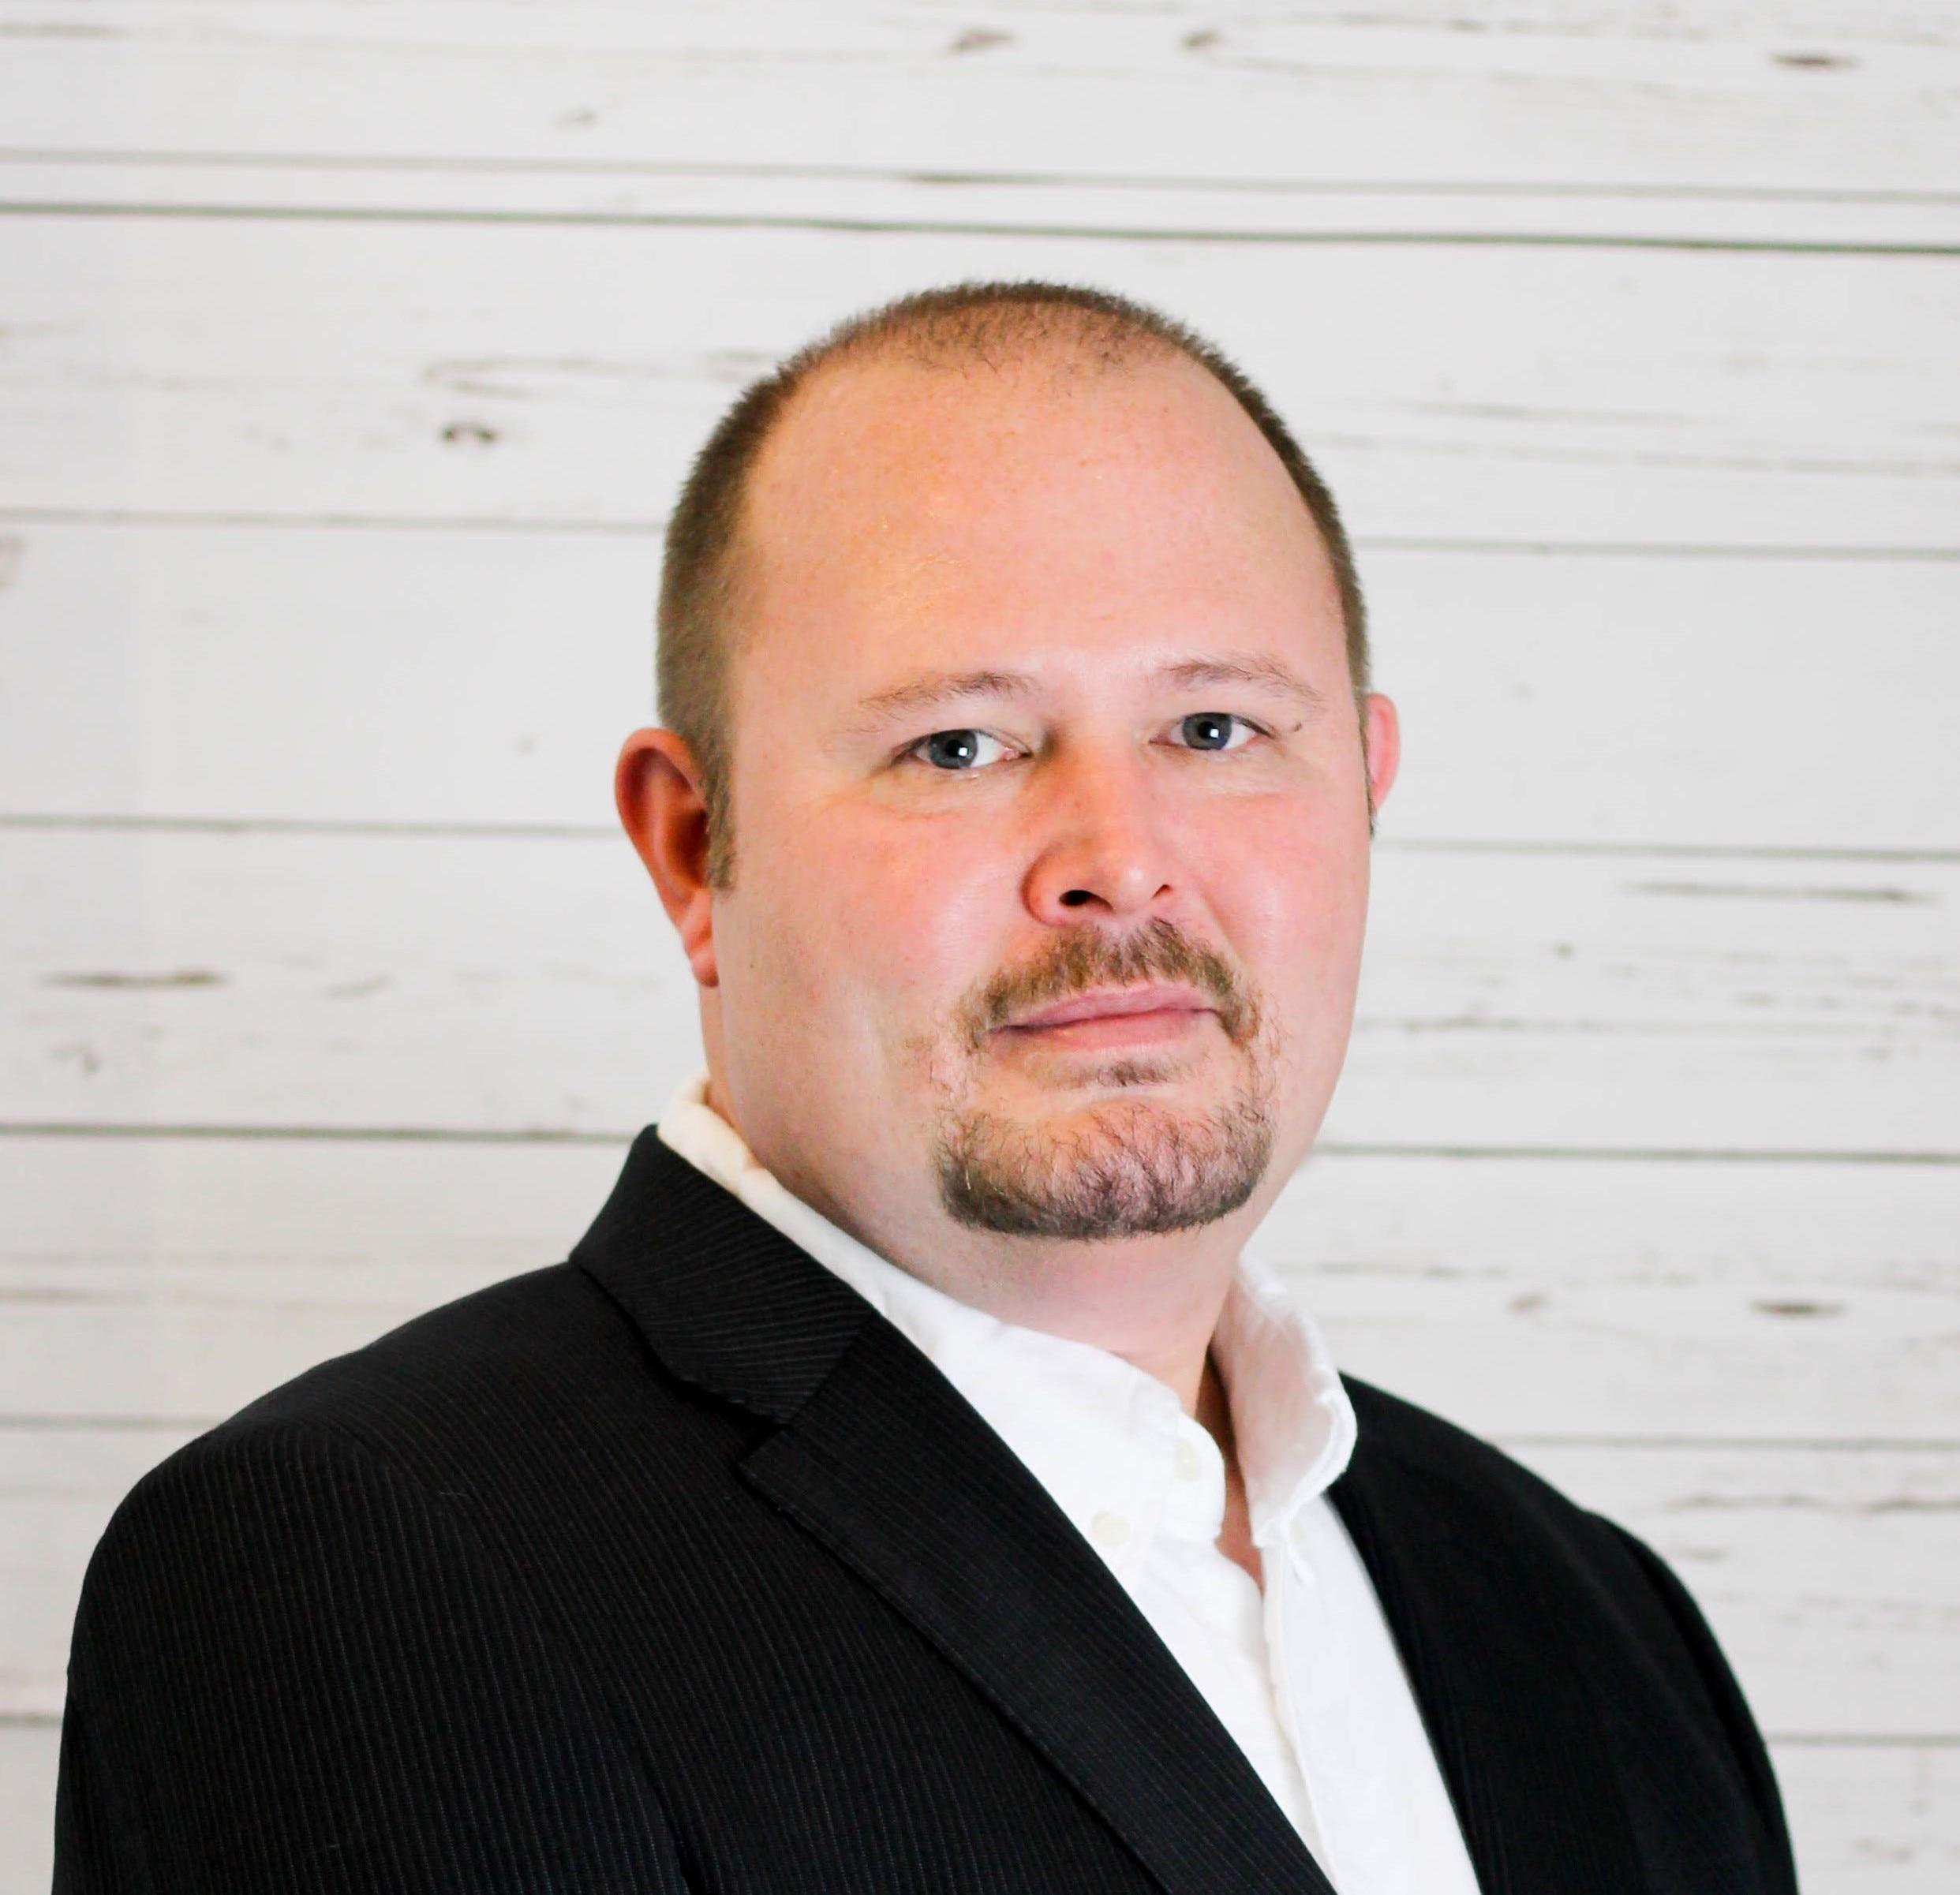 JAMES JEFFERY SHELTON  Your Financial Professional & Insurance Agent